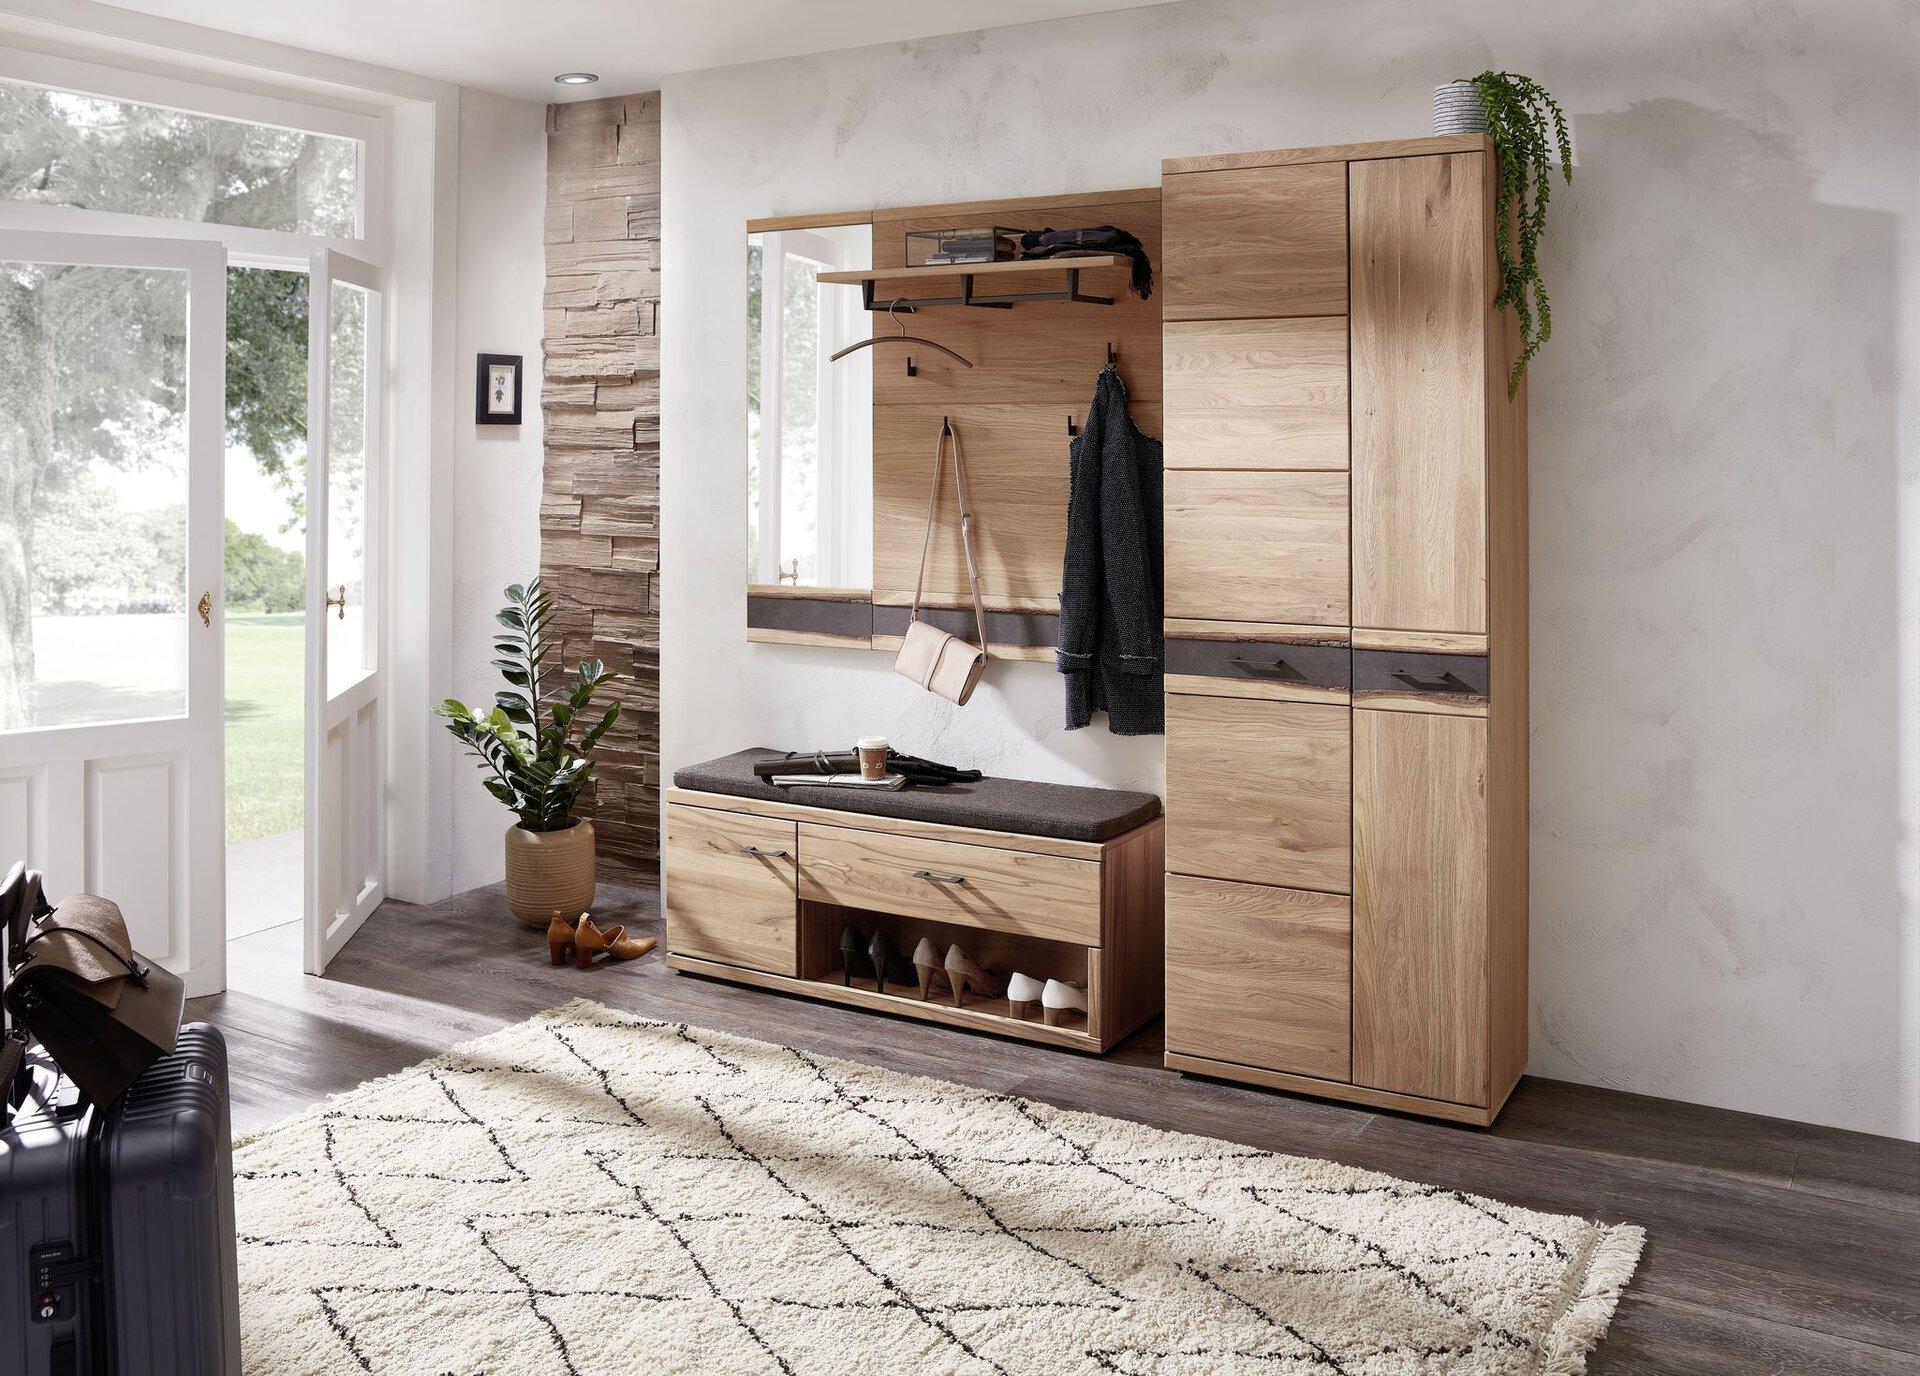 Garderobenpaneel Crusty Wohn-Concept Holz braun 28 x 116 x 84 cm